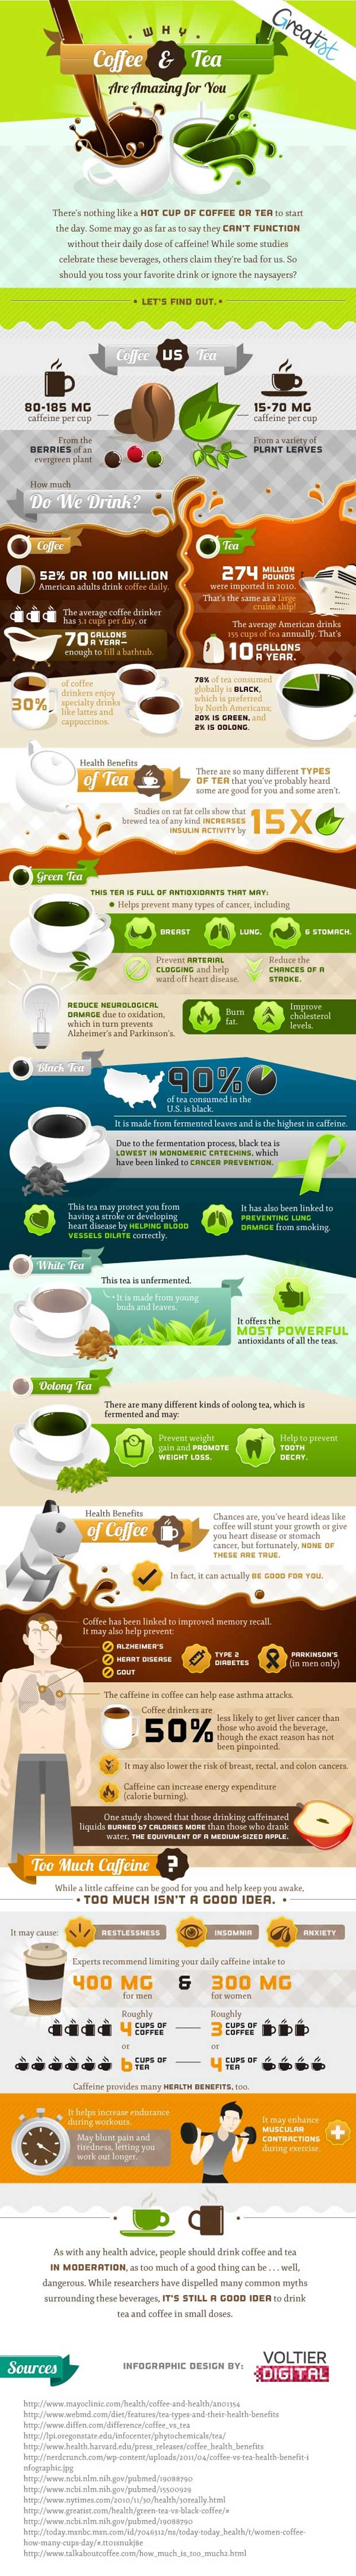 Heath benefits of coffee and tea infographic